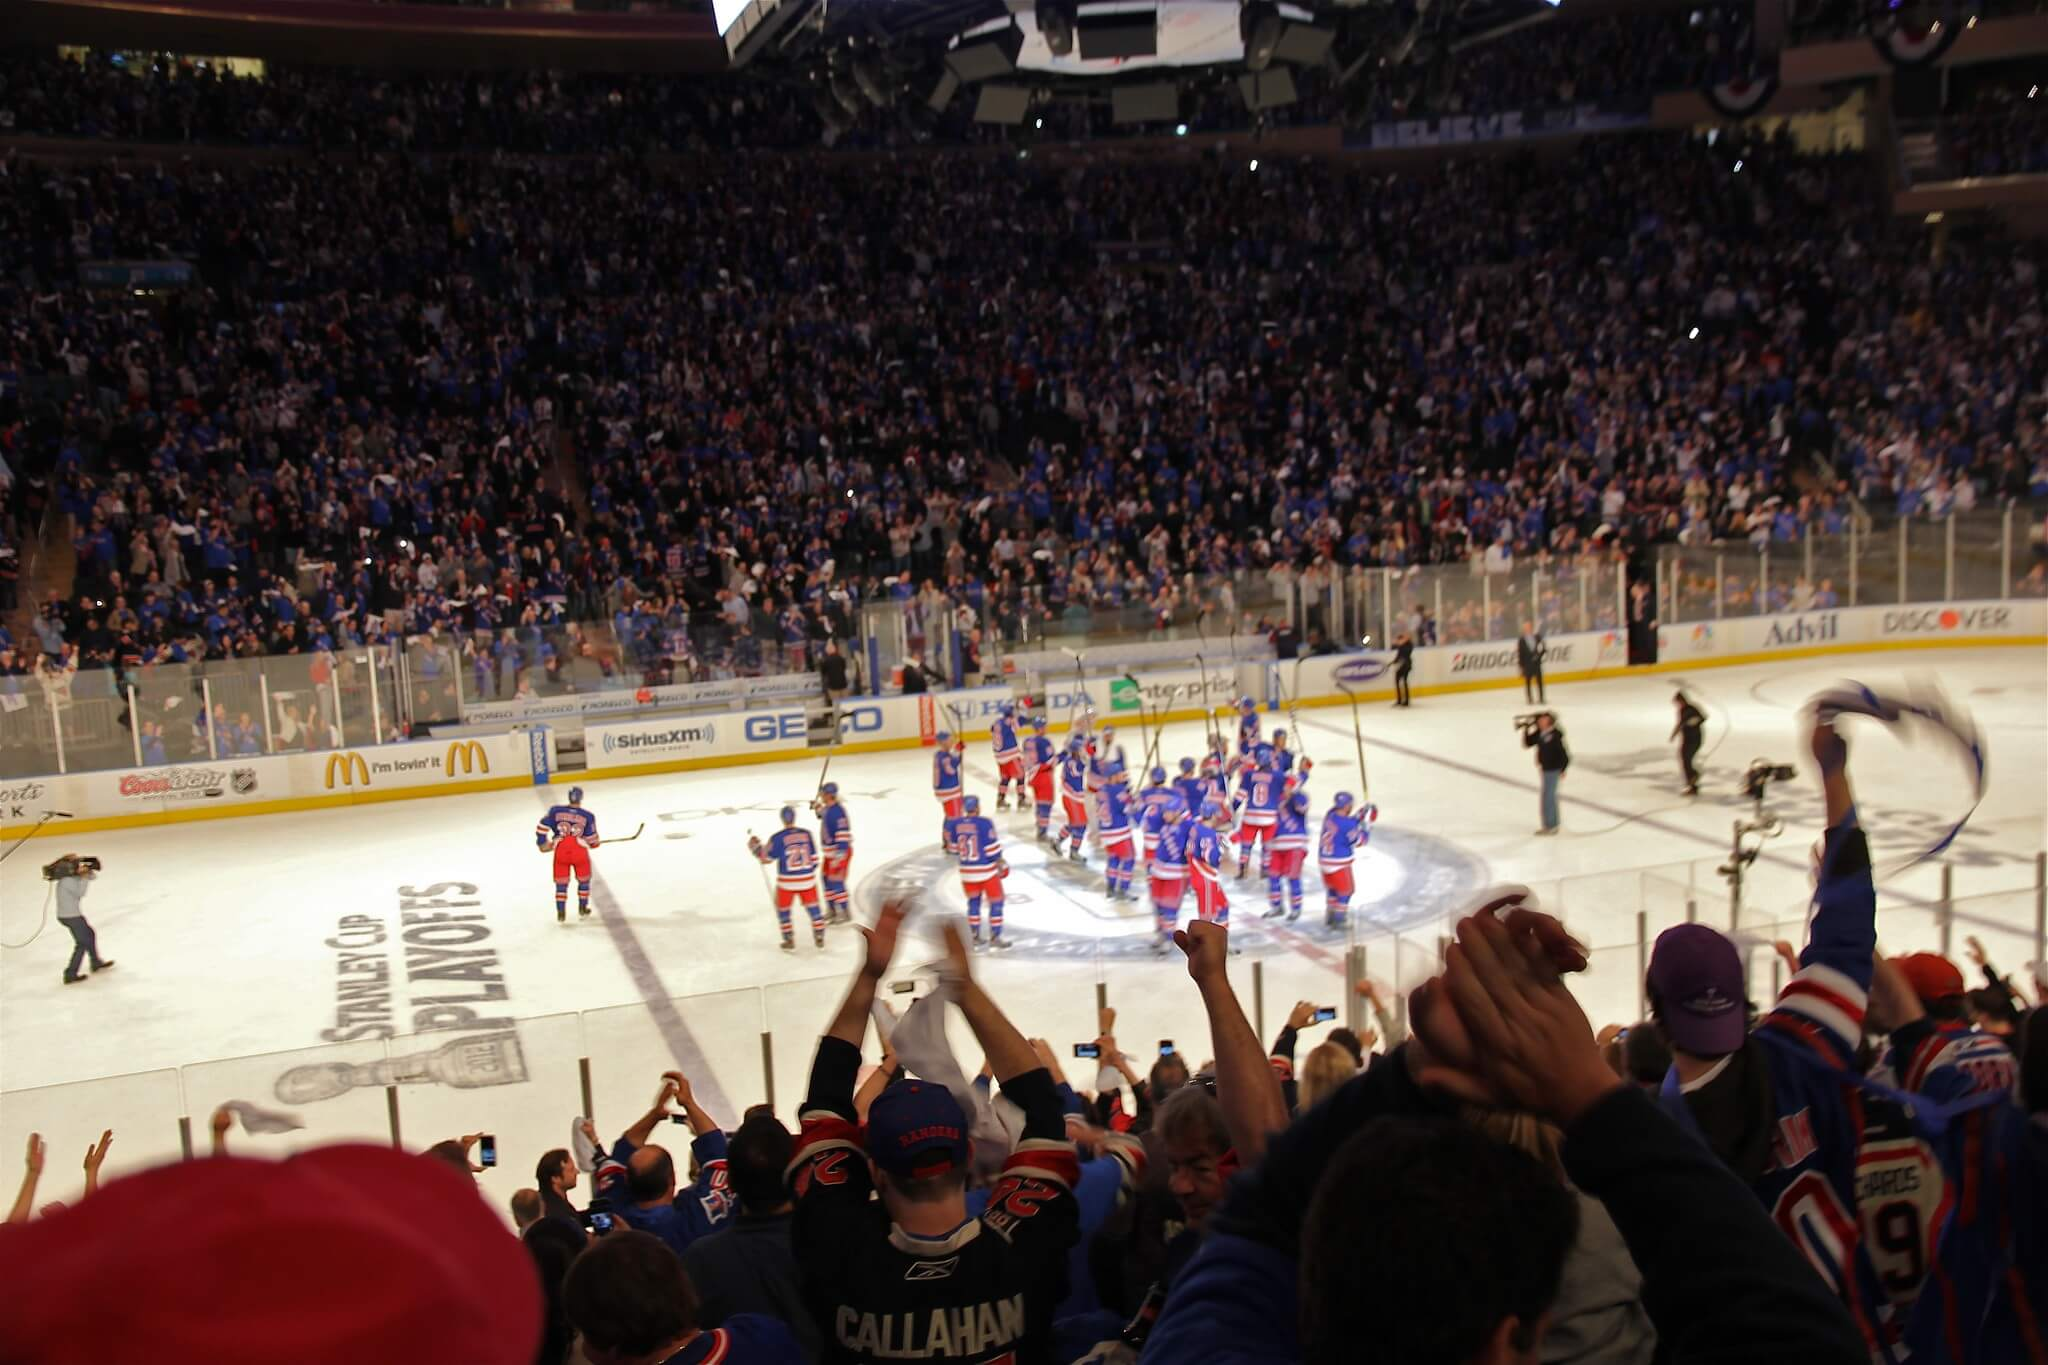 New York Rangers fans